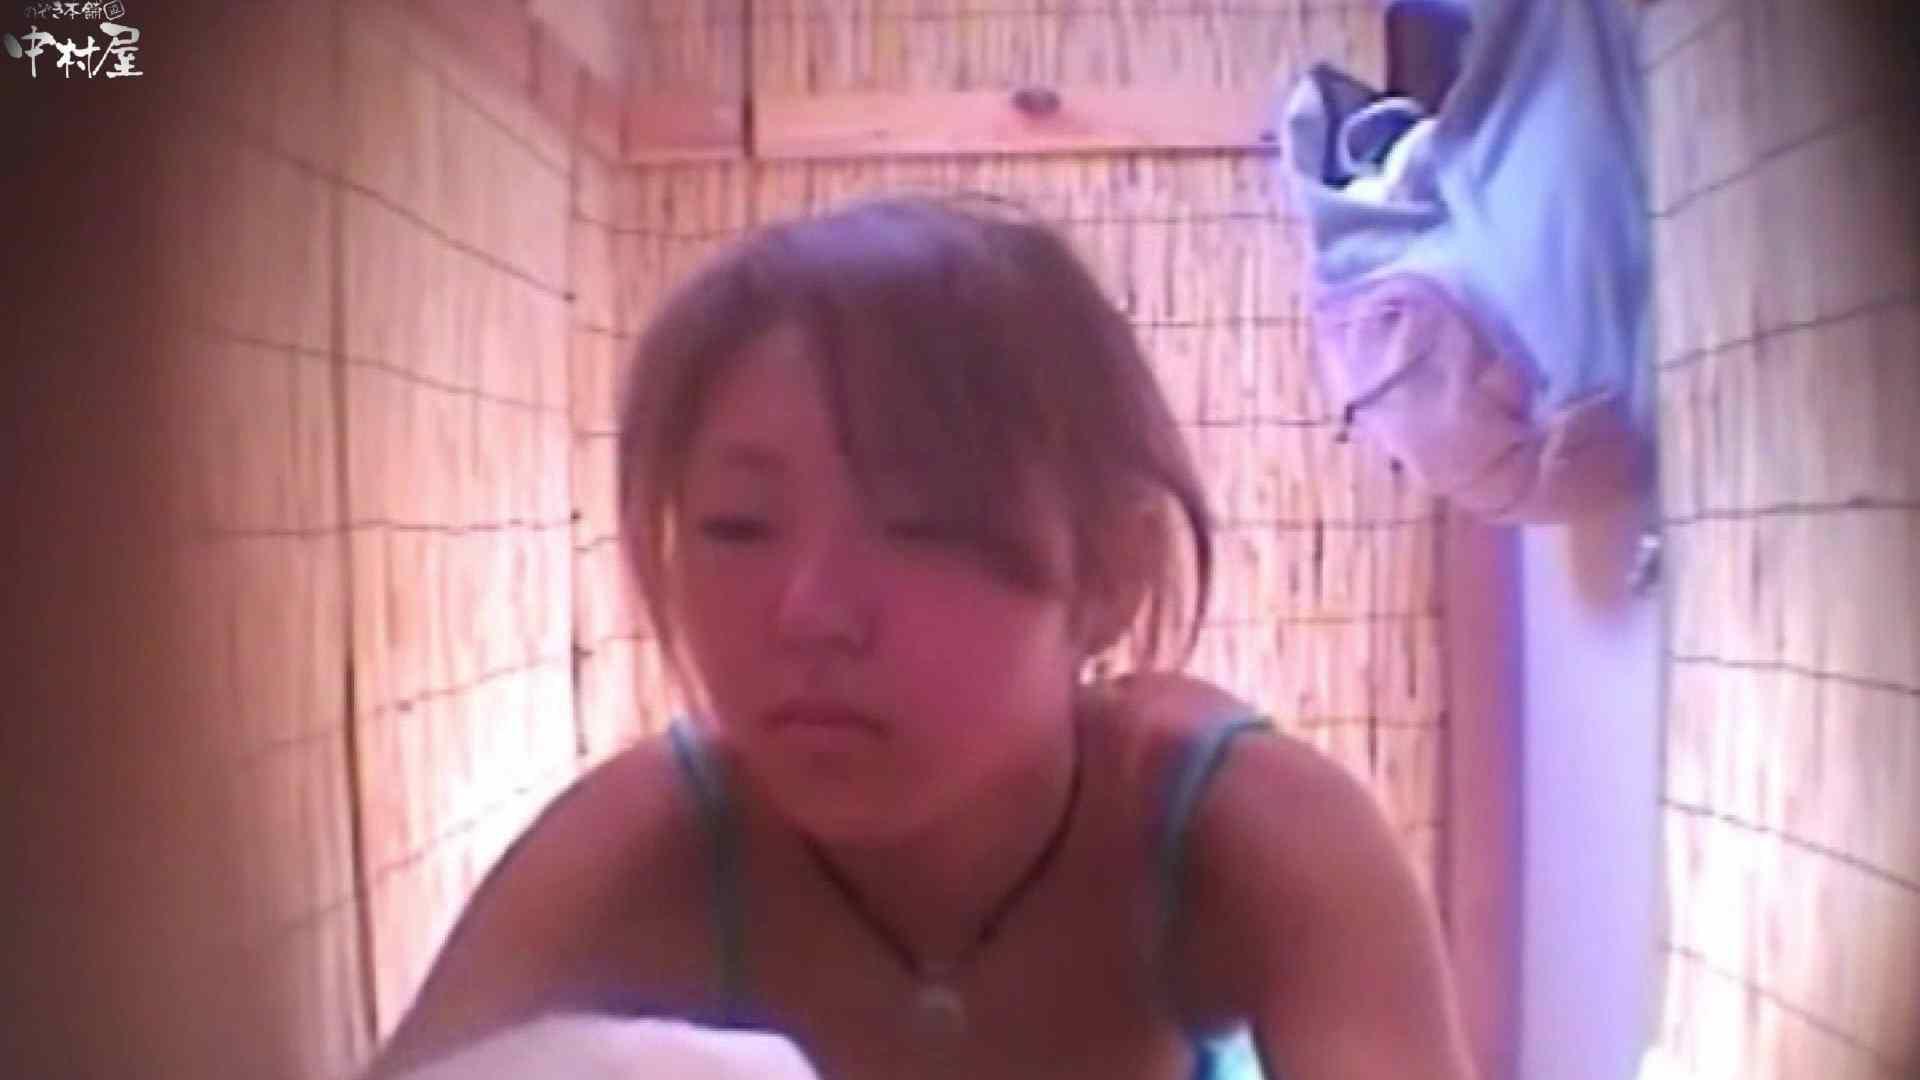 Summer beaches!Toilet peeping!Vol.02 日焼け 盗み撮り動画キャプチャ 77pic 17